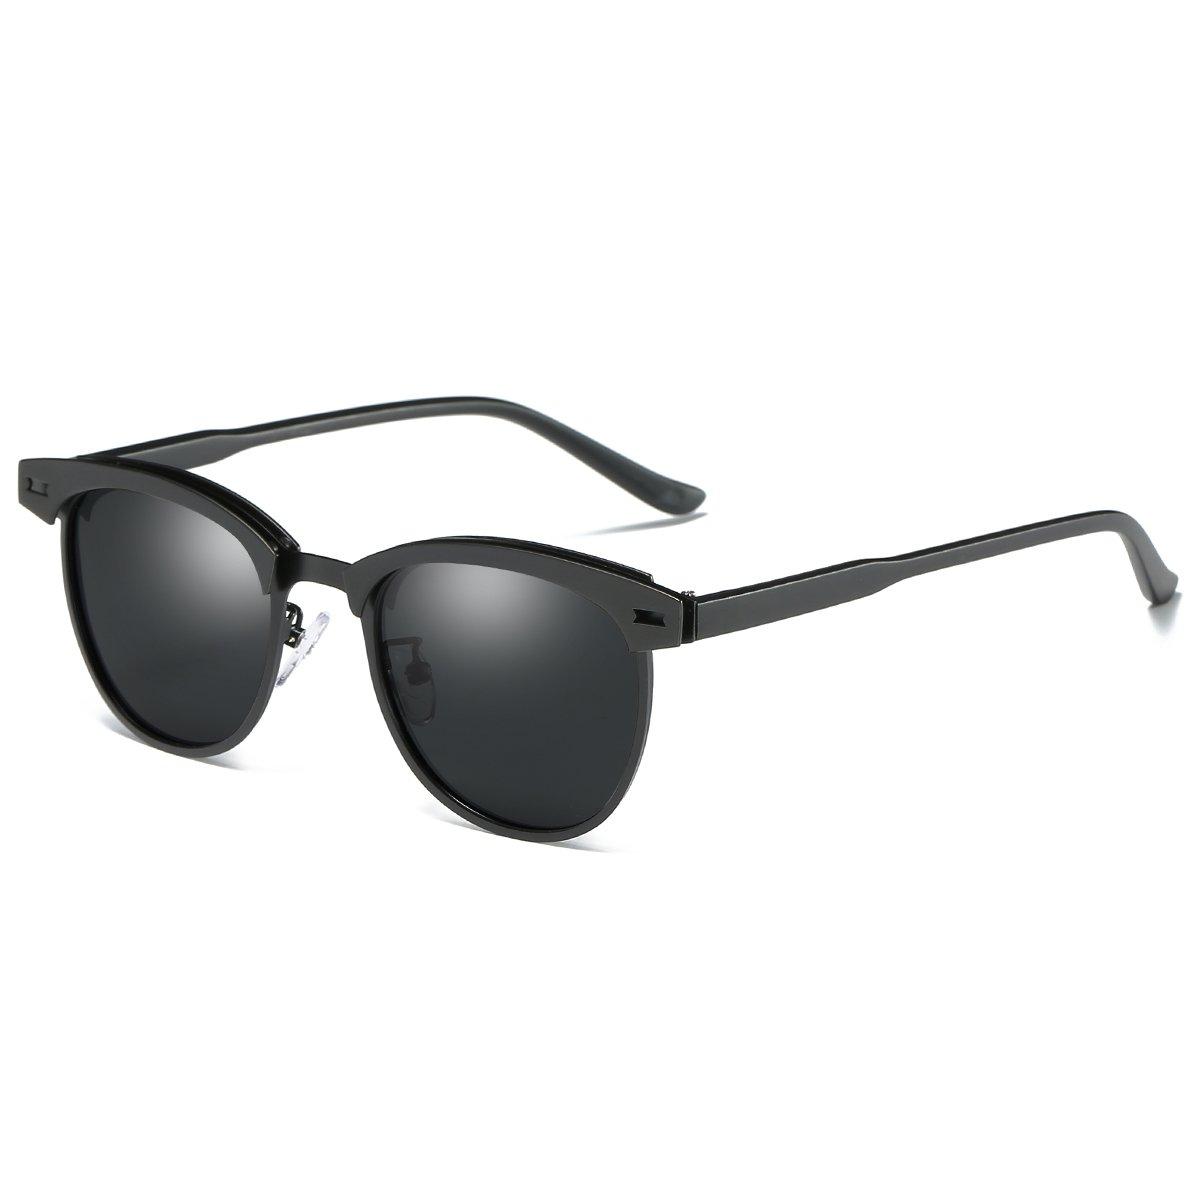 8adcff1689653 Amazon.com  Semi Rimless Polarized Sunglasses for Men Classic Metal Retro  Rivets Women Sun Glasses with Case (Black Grey)  Clothing